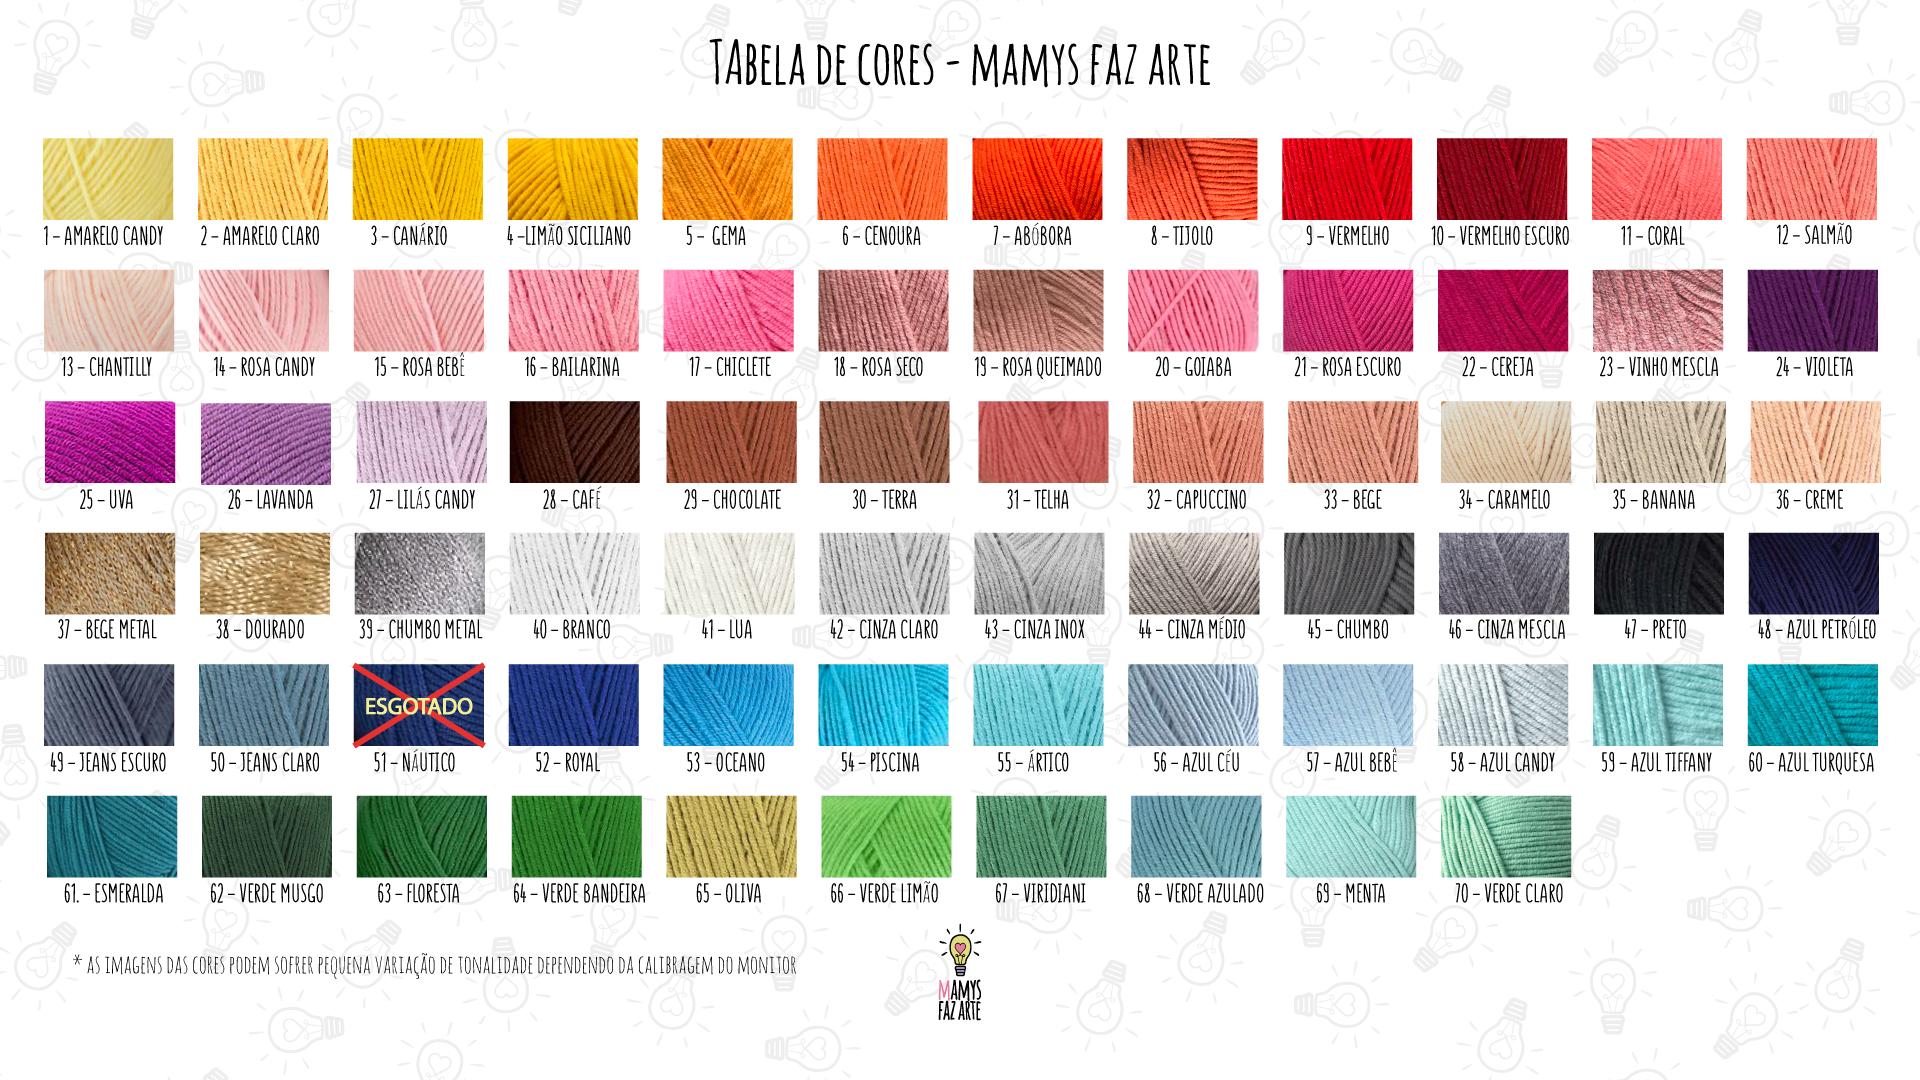 tabela-cores-1920-x-1081